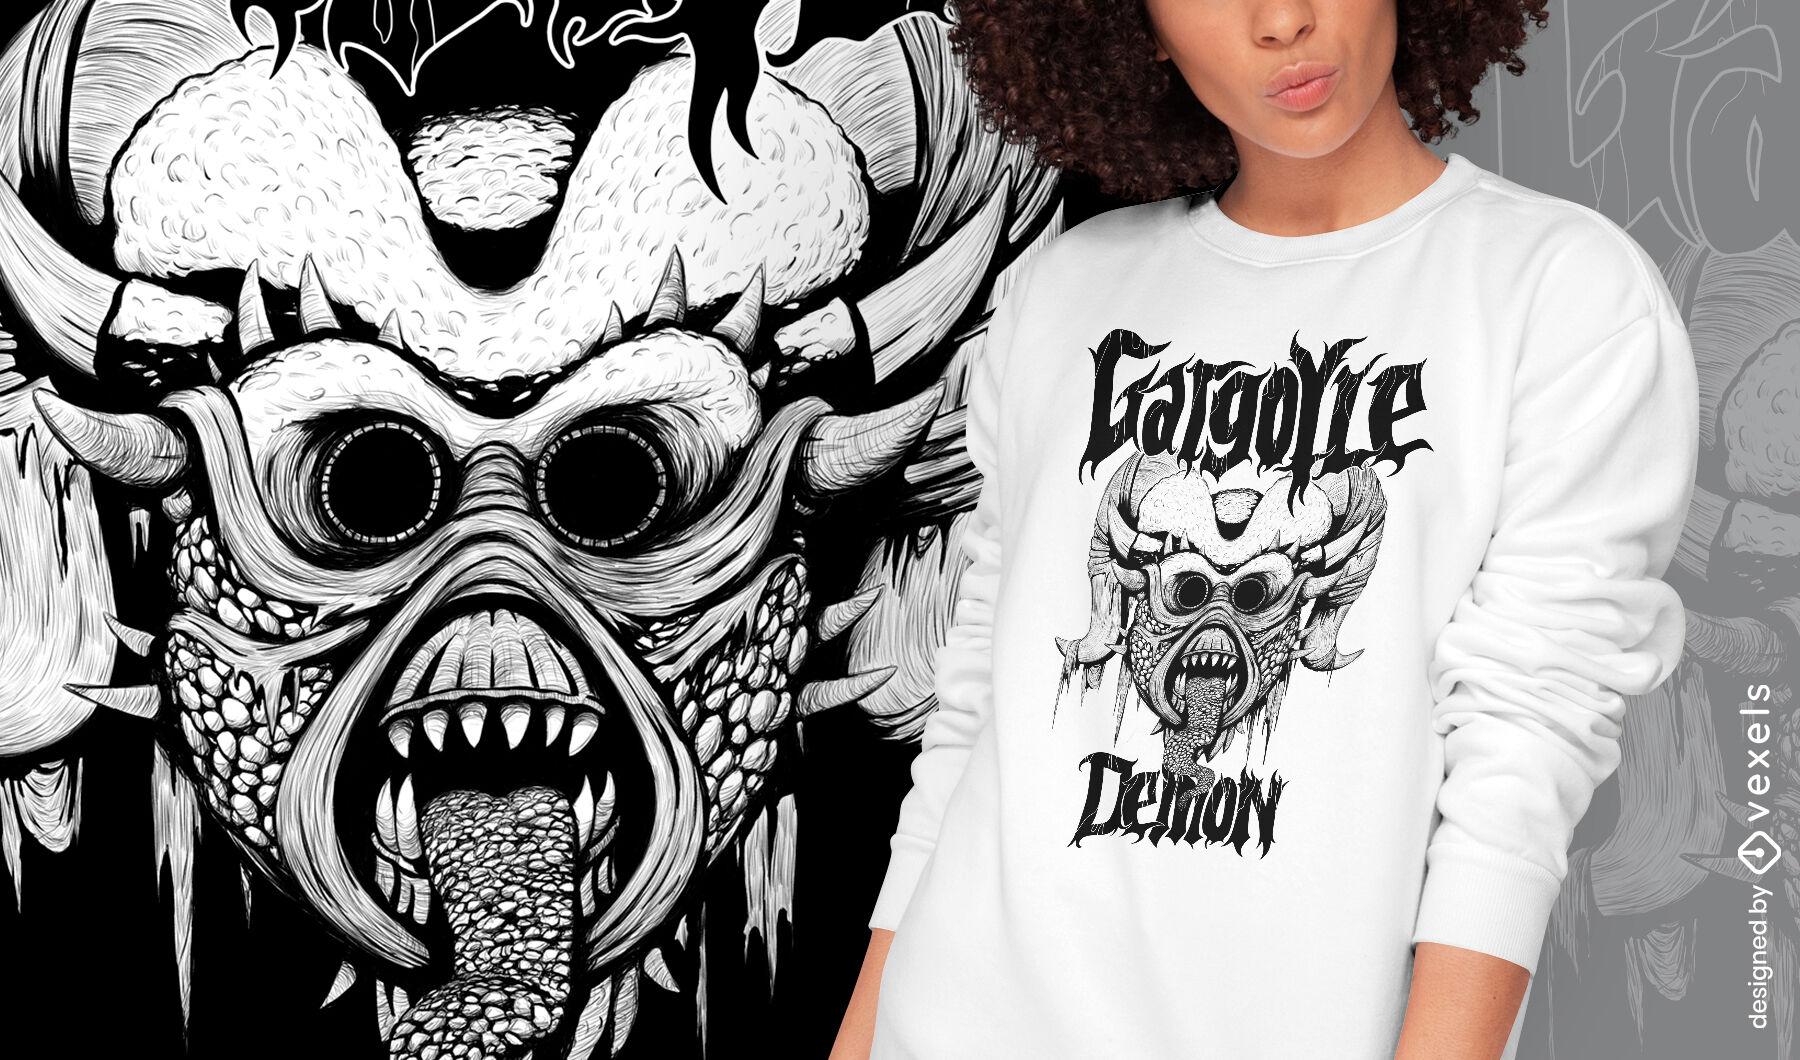 Gargoyle demon monster hand drawn t-shirt psd